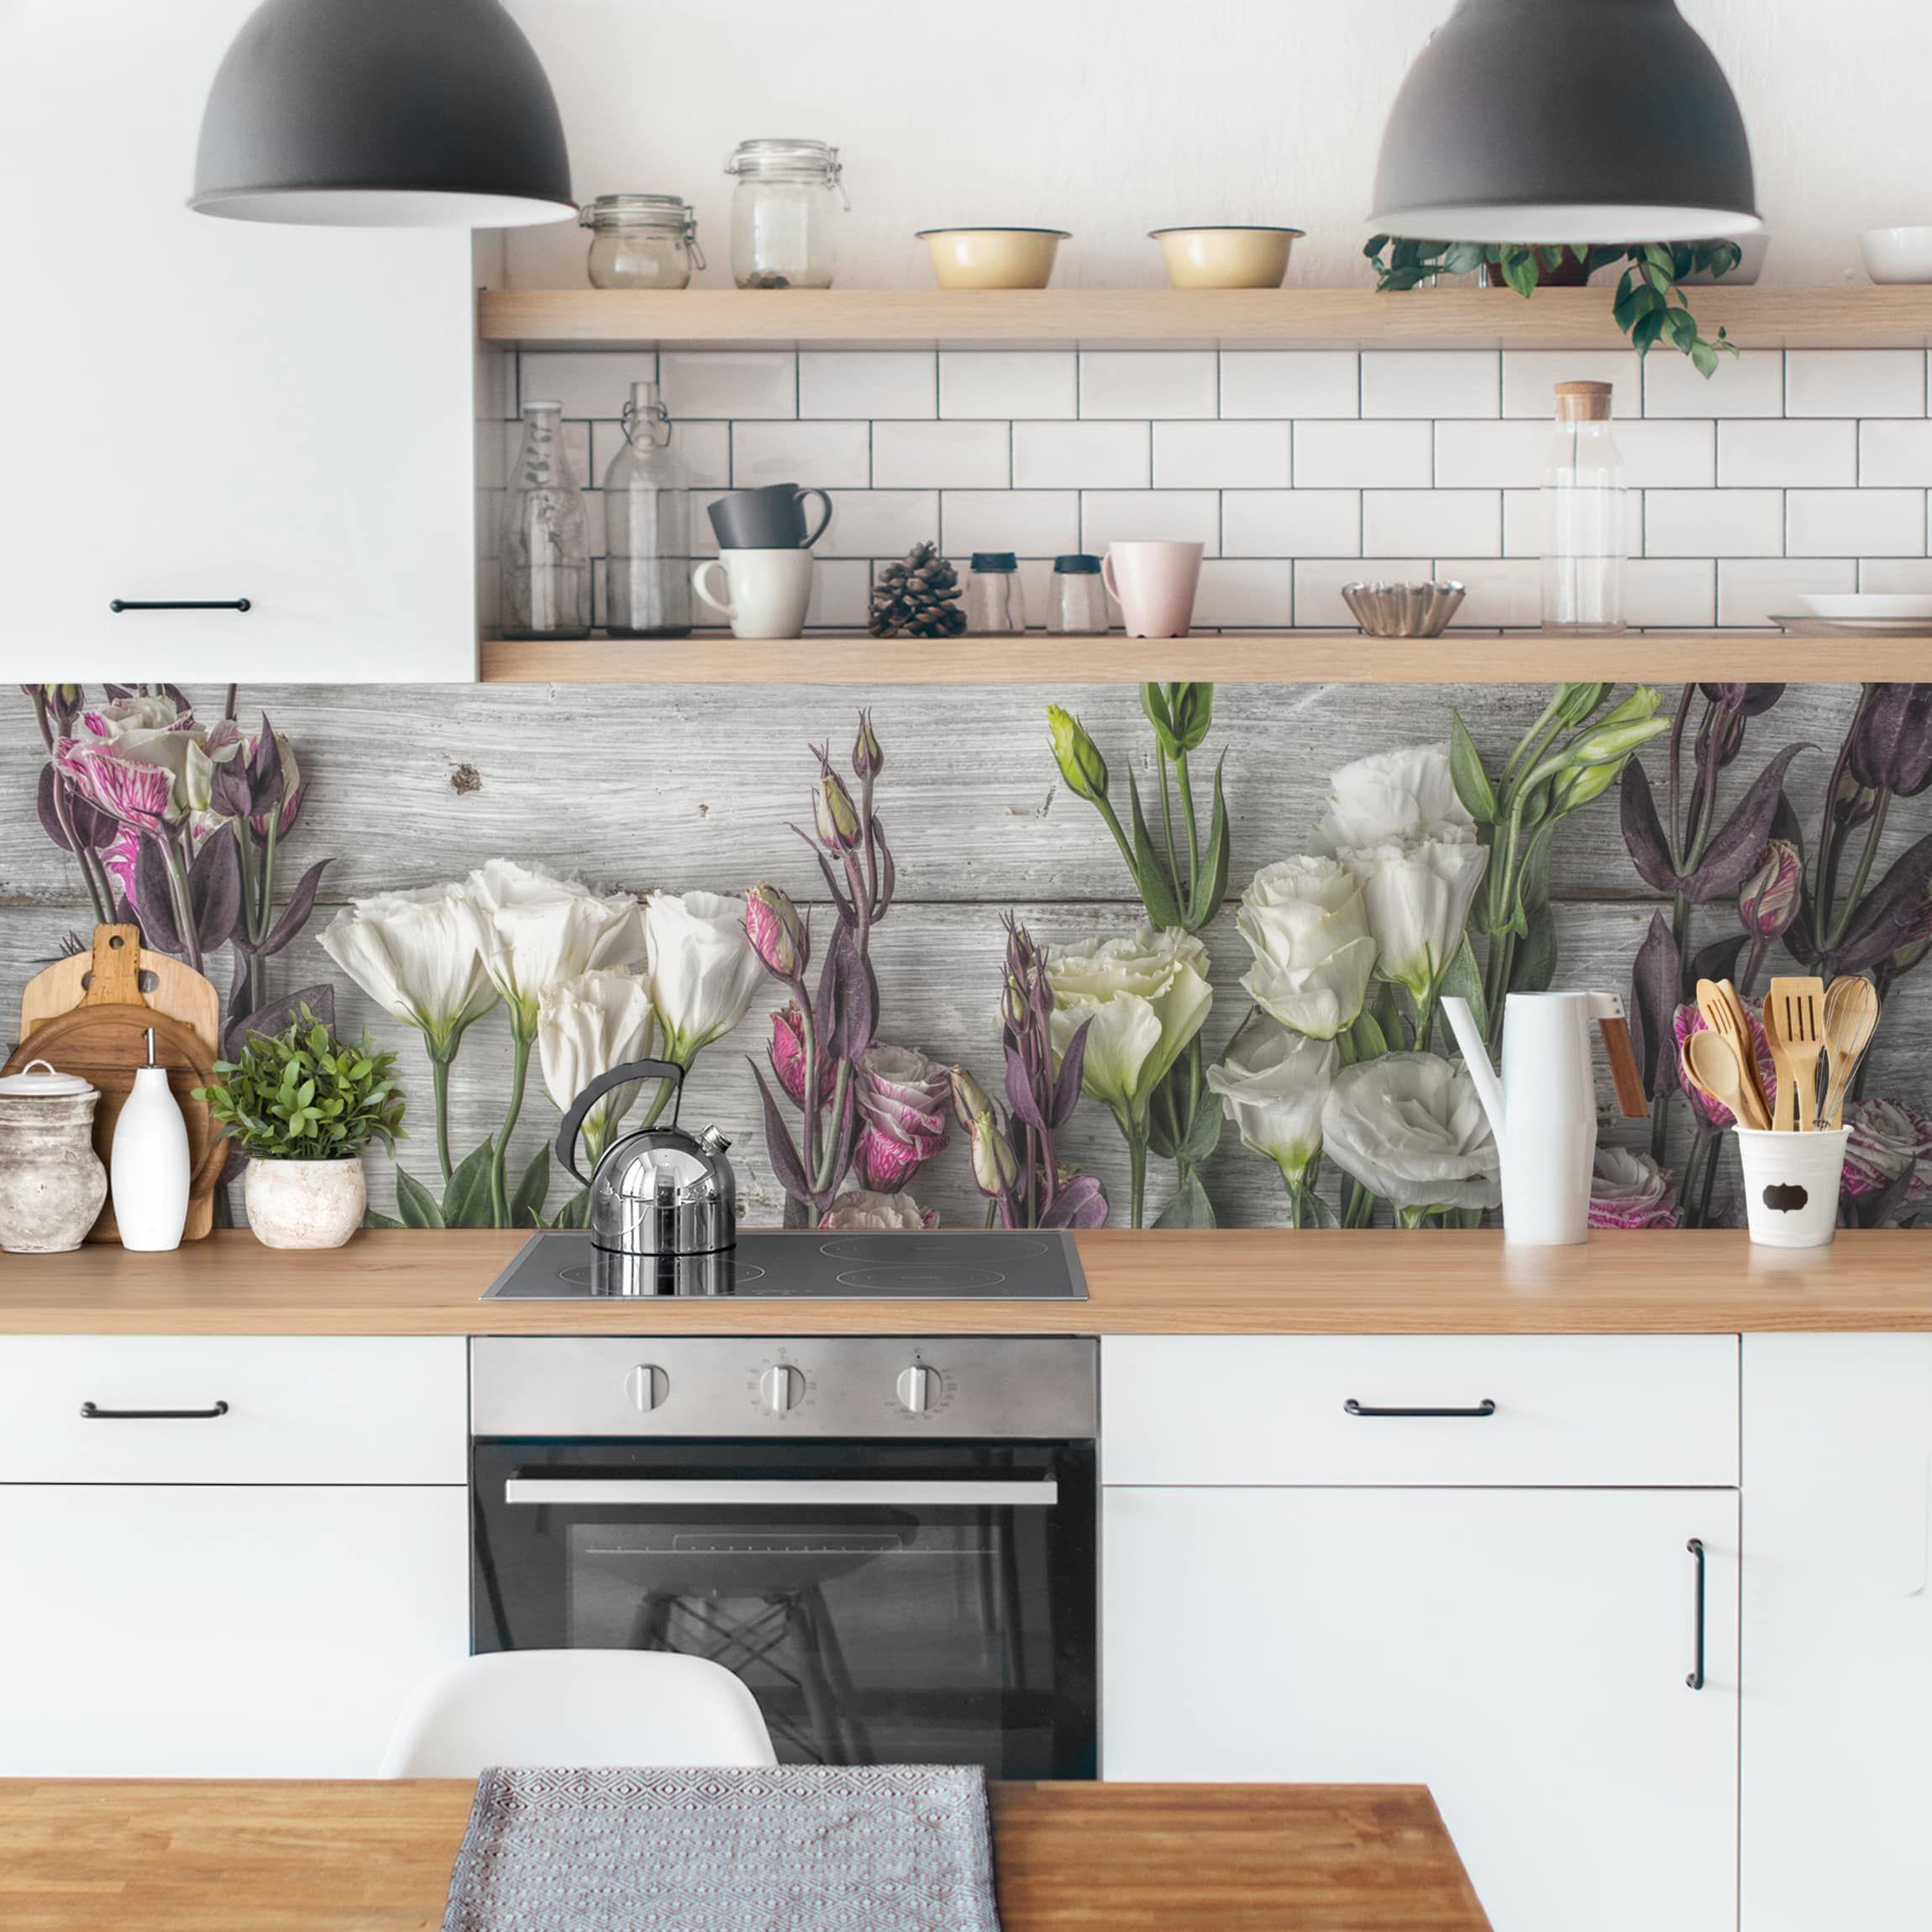 Kuchenruckwand Tulpen Rose Shabby Holzoptik Kuchenruckwandfolie Schrank Kuche Bauernhaus Kuchenschranke Holzoptik